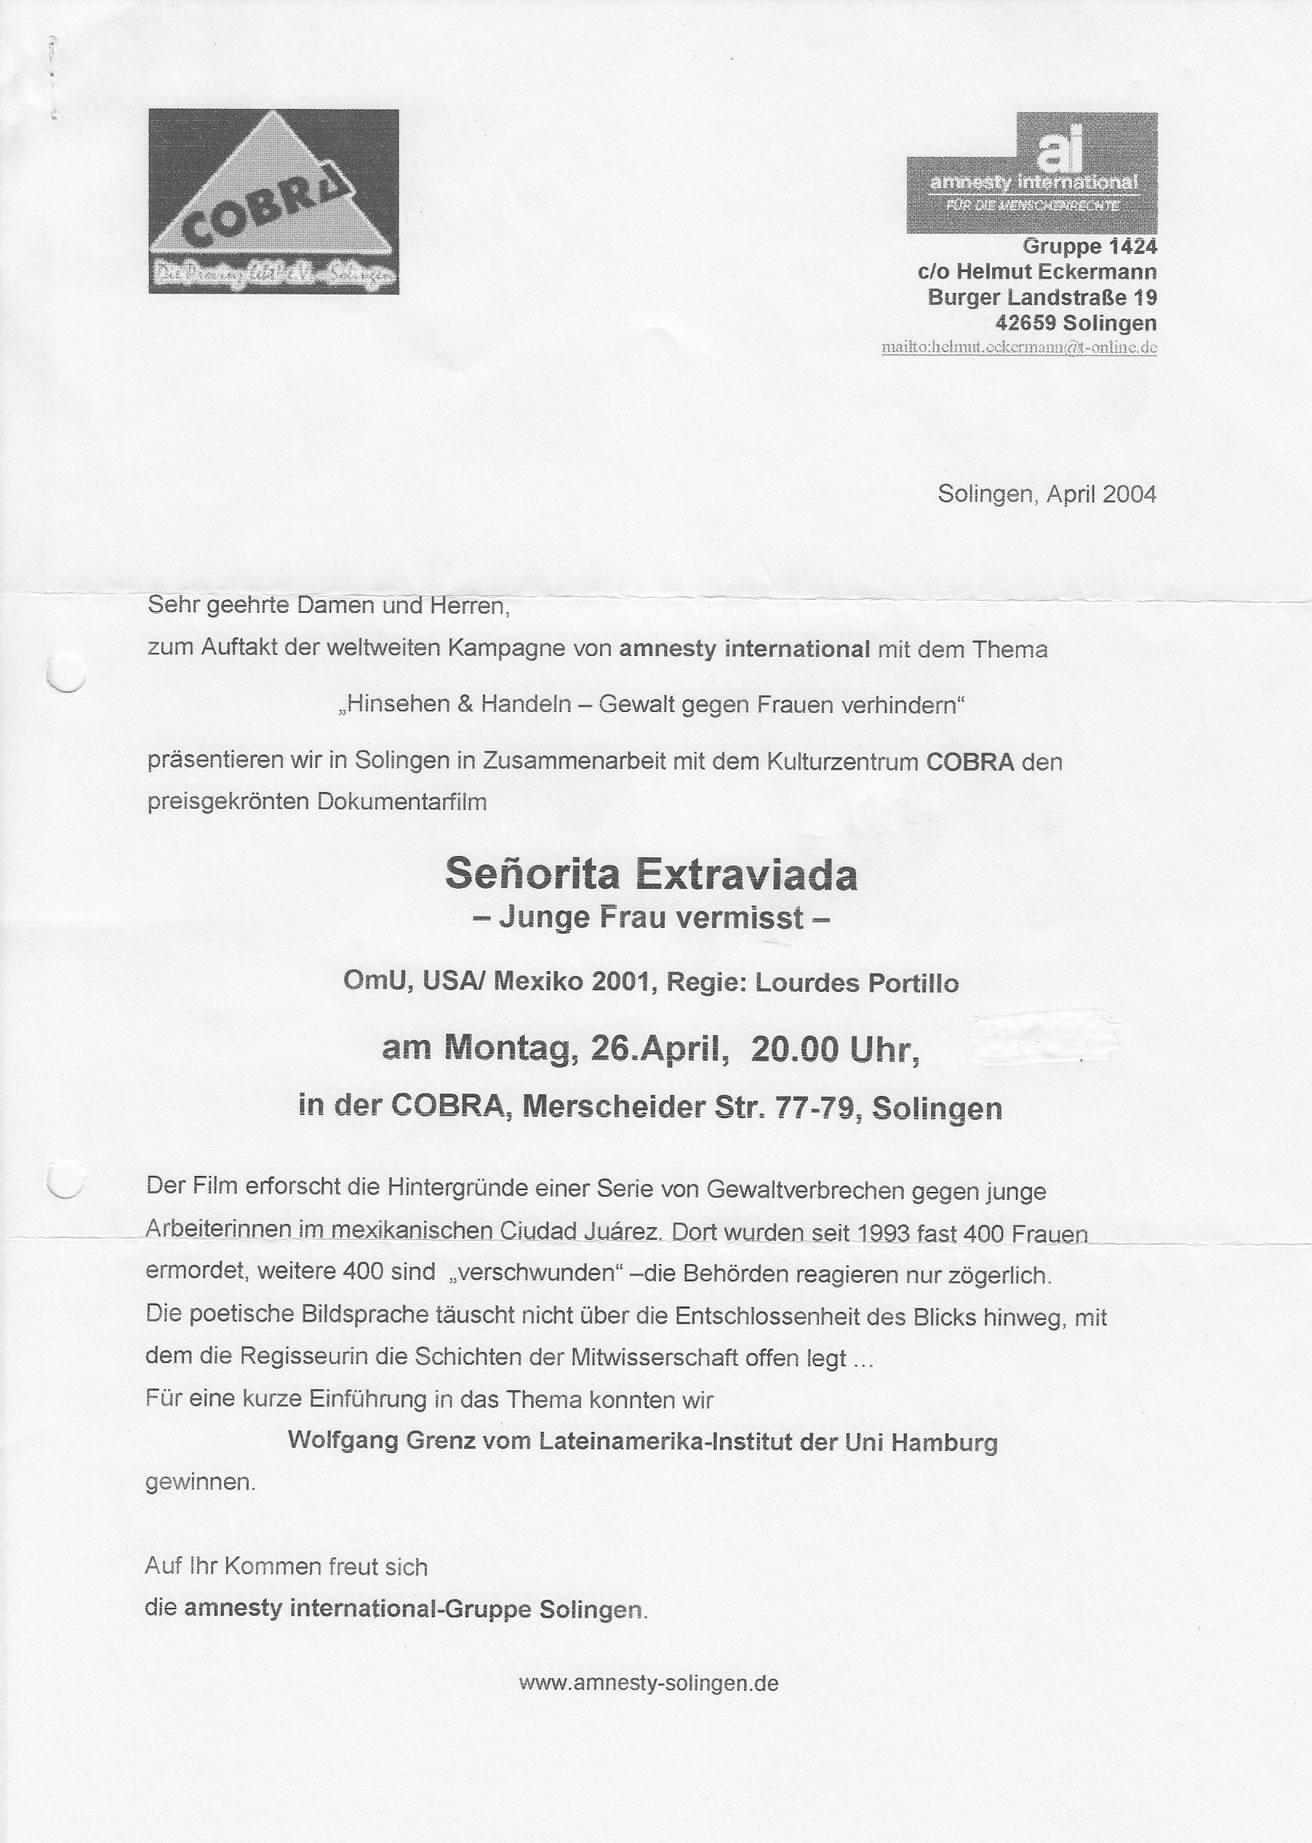 Pressemitteilung Cobra zum Film Senorita Extraviada